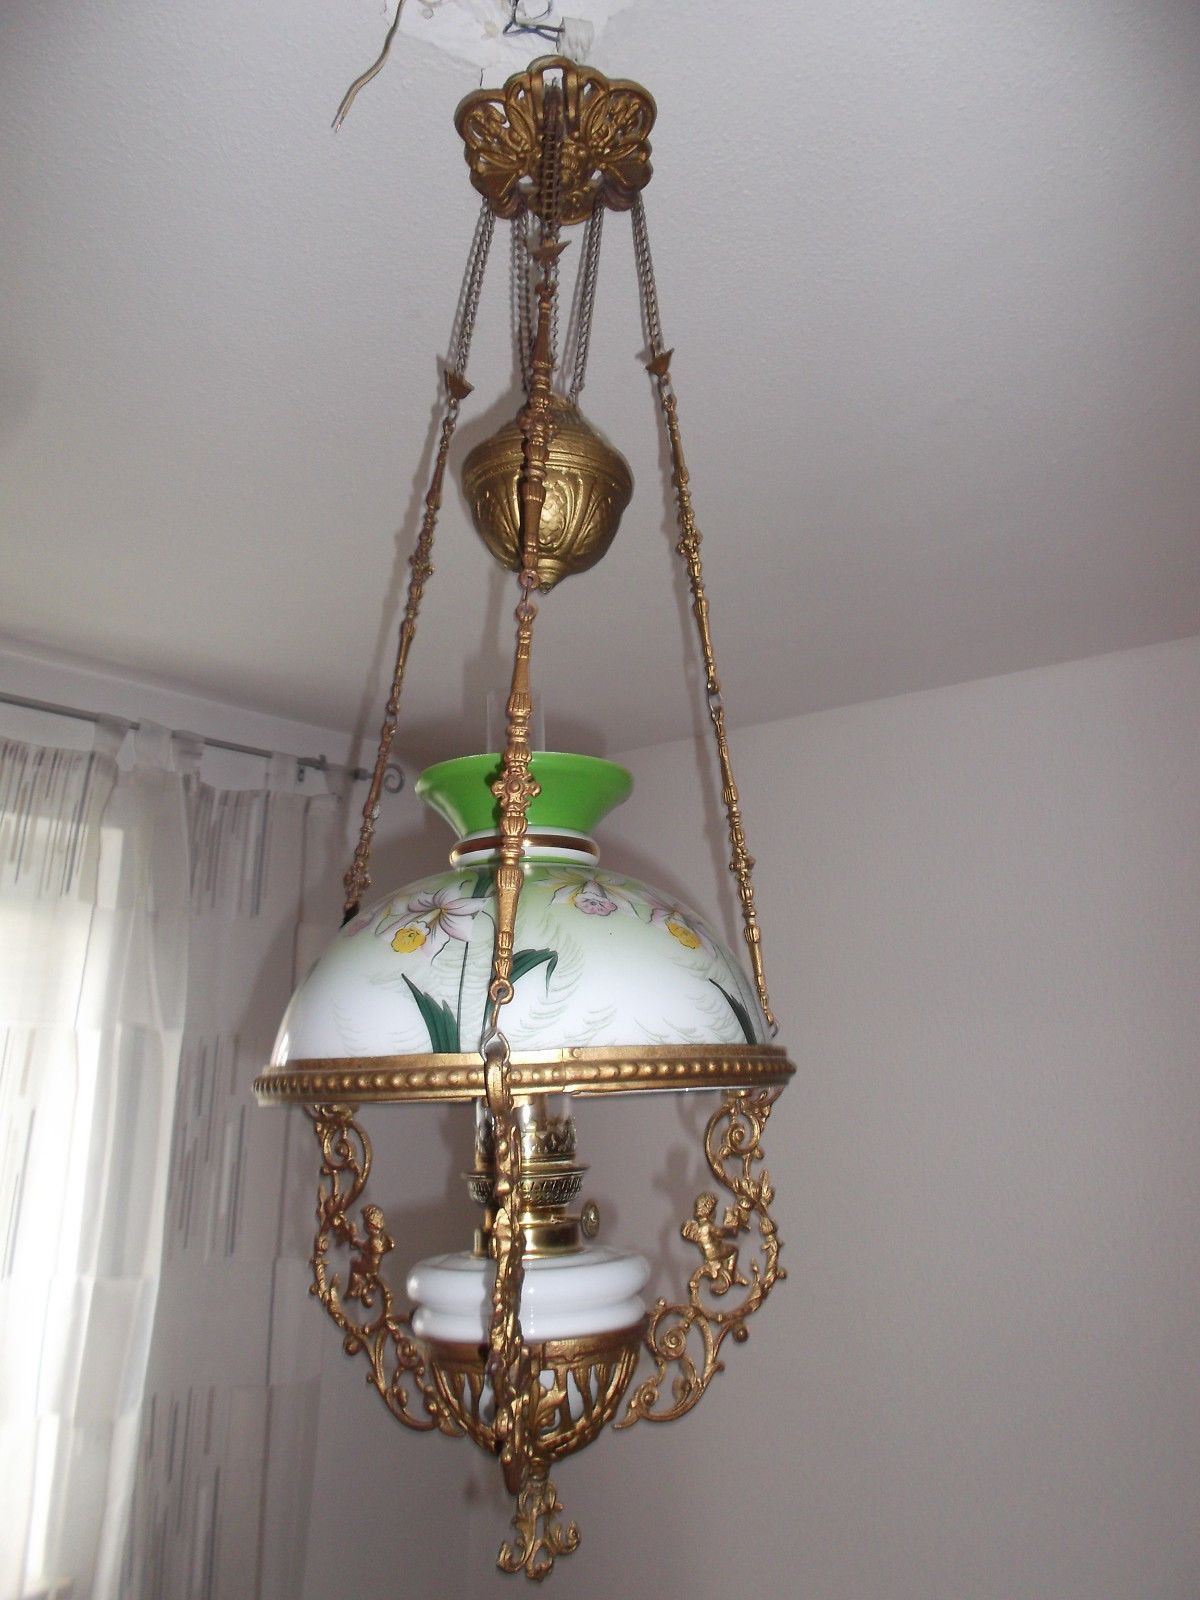 Hanging Oil Petroleum Kerosene Lamp Shade Gaudard A P Morbier Vintage LightingVintage LampsAntique